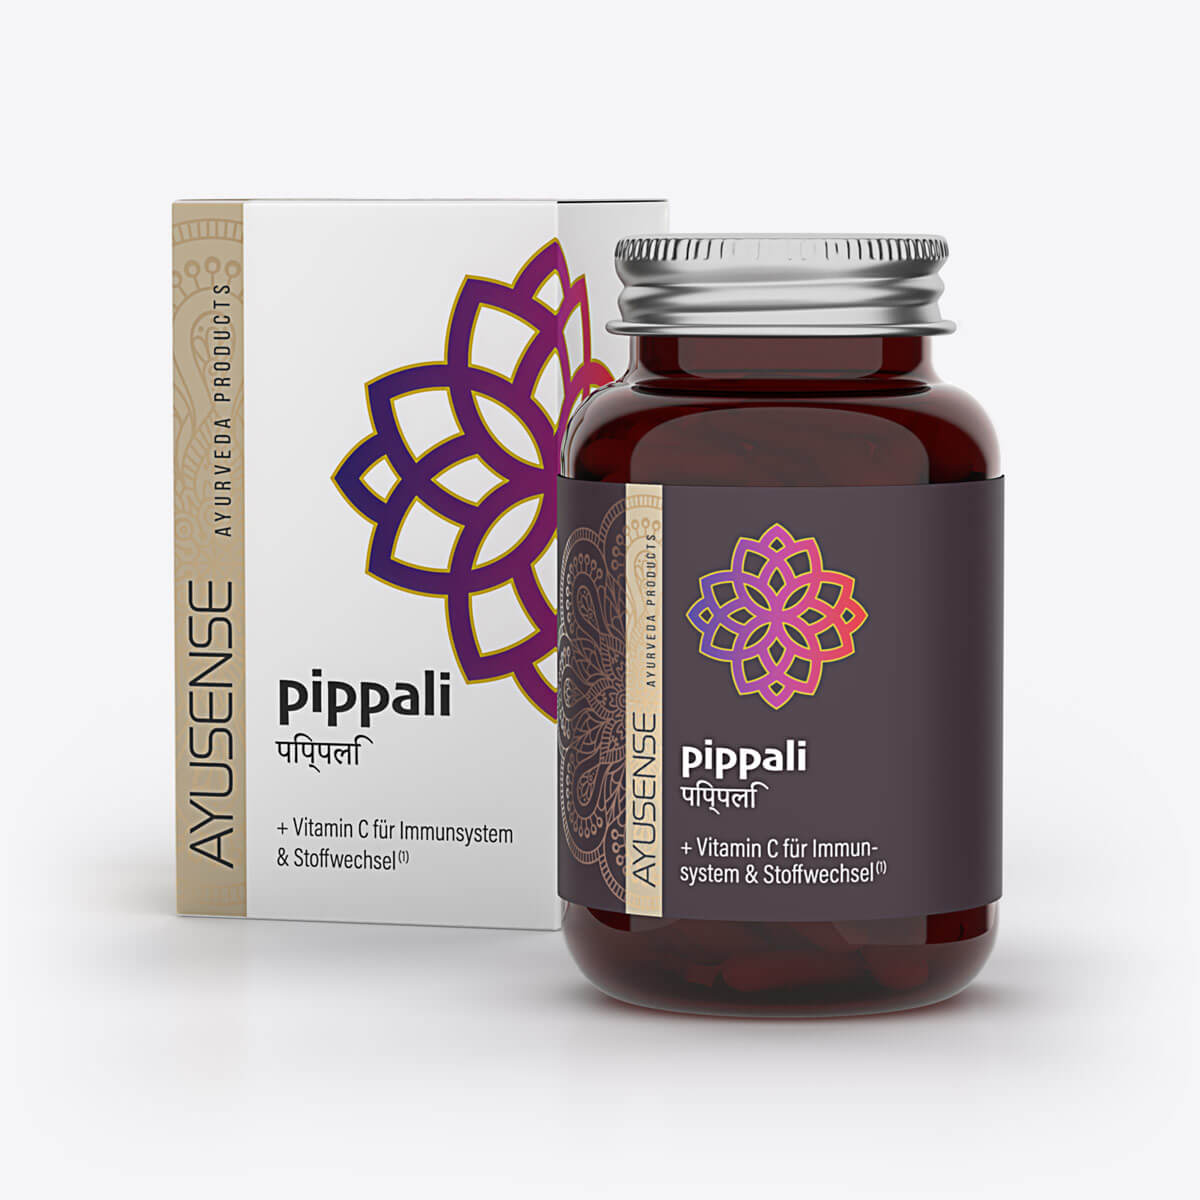 PIPPALI